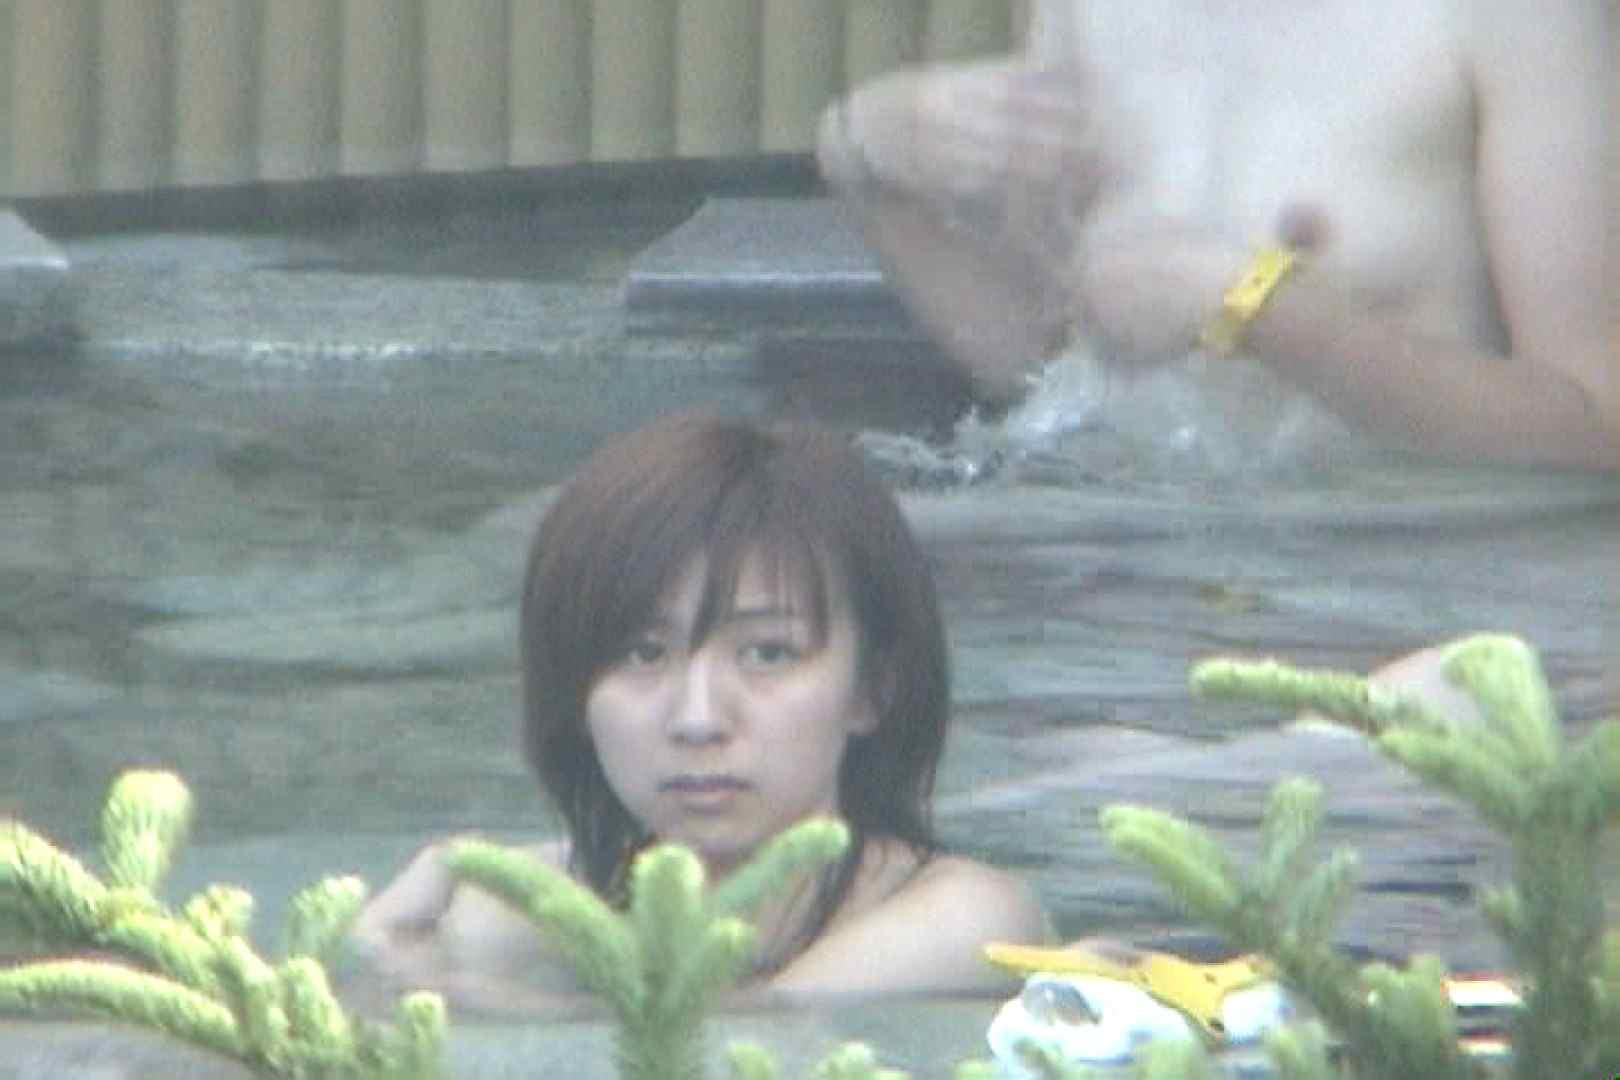 Aquaな露天風呂Vol.77【VIP限定】 露天風呂編 | 盗撮シリーズ  100PIX 75